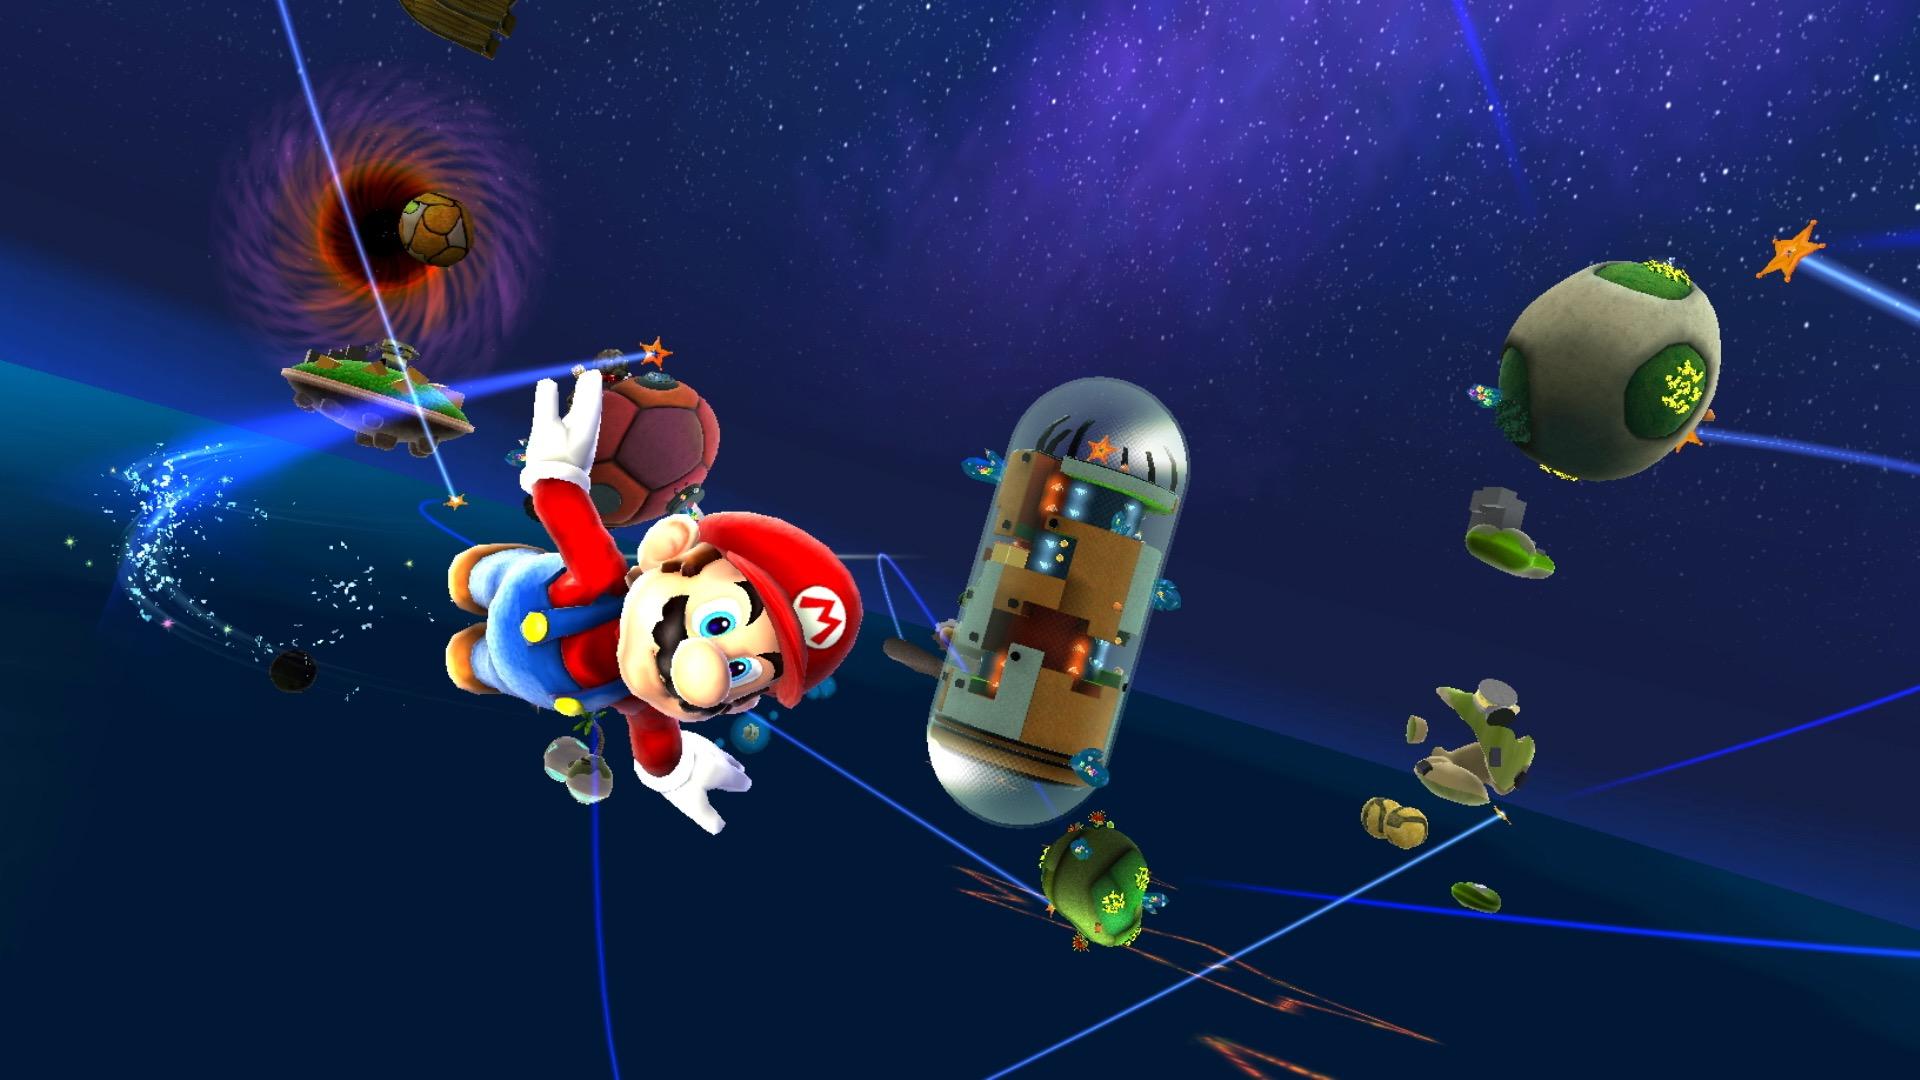 Super Mario Galaxy: Every hidden star